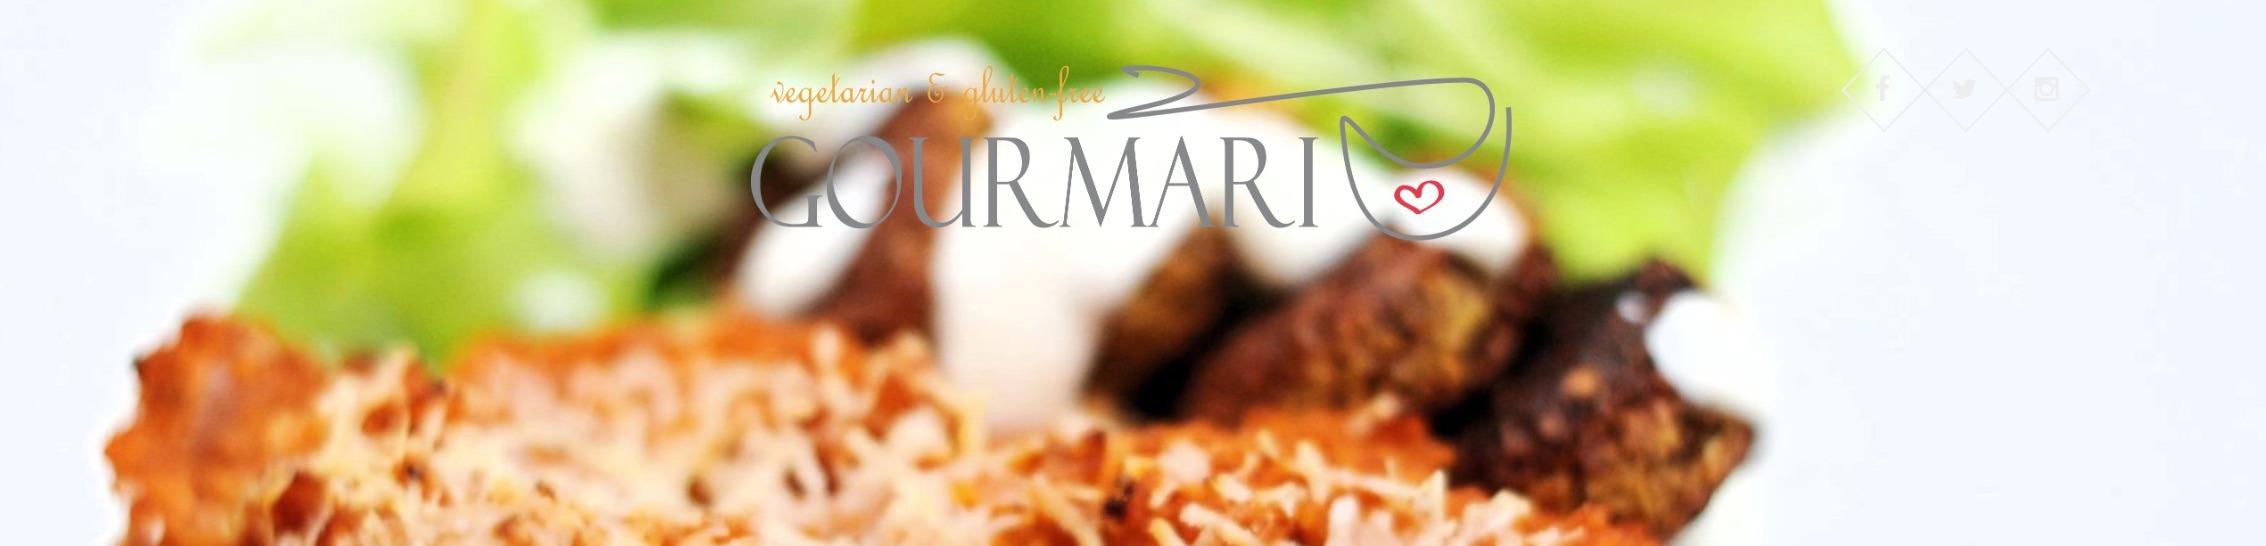 Banner_Gourmari_-_Vegetarian_and_Gluten-free